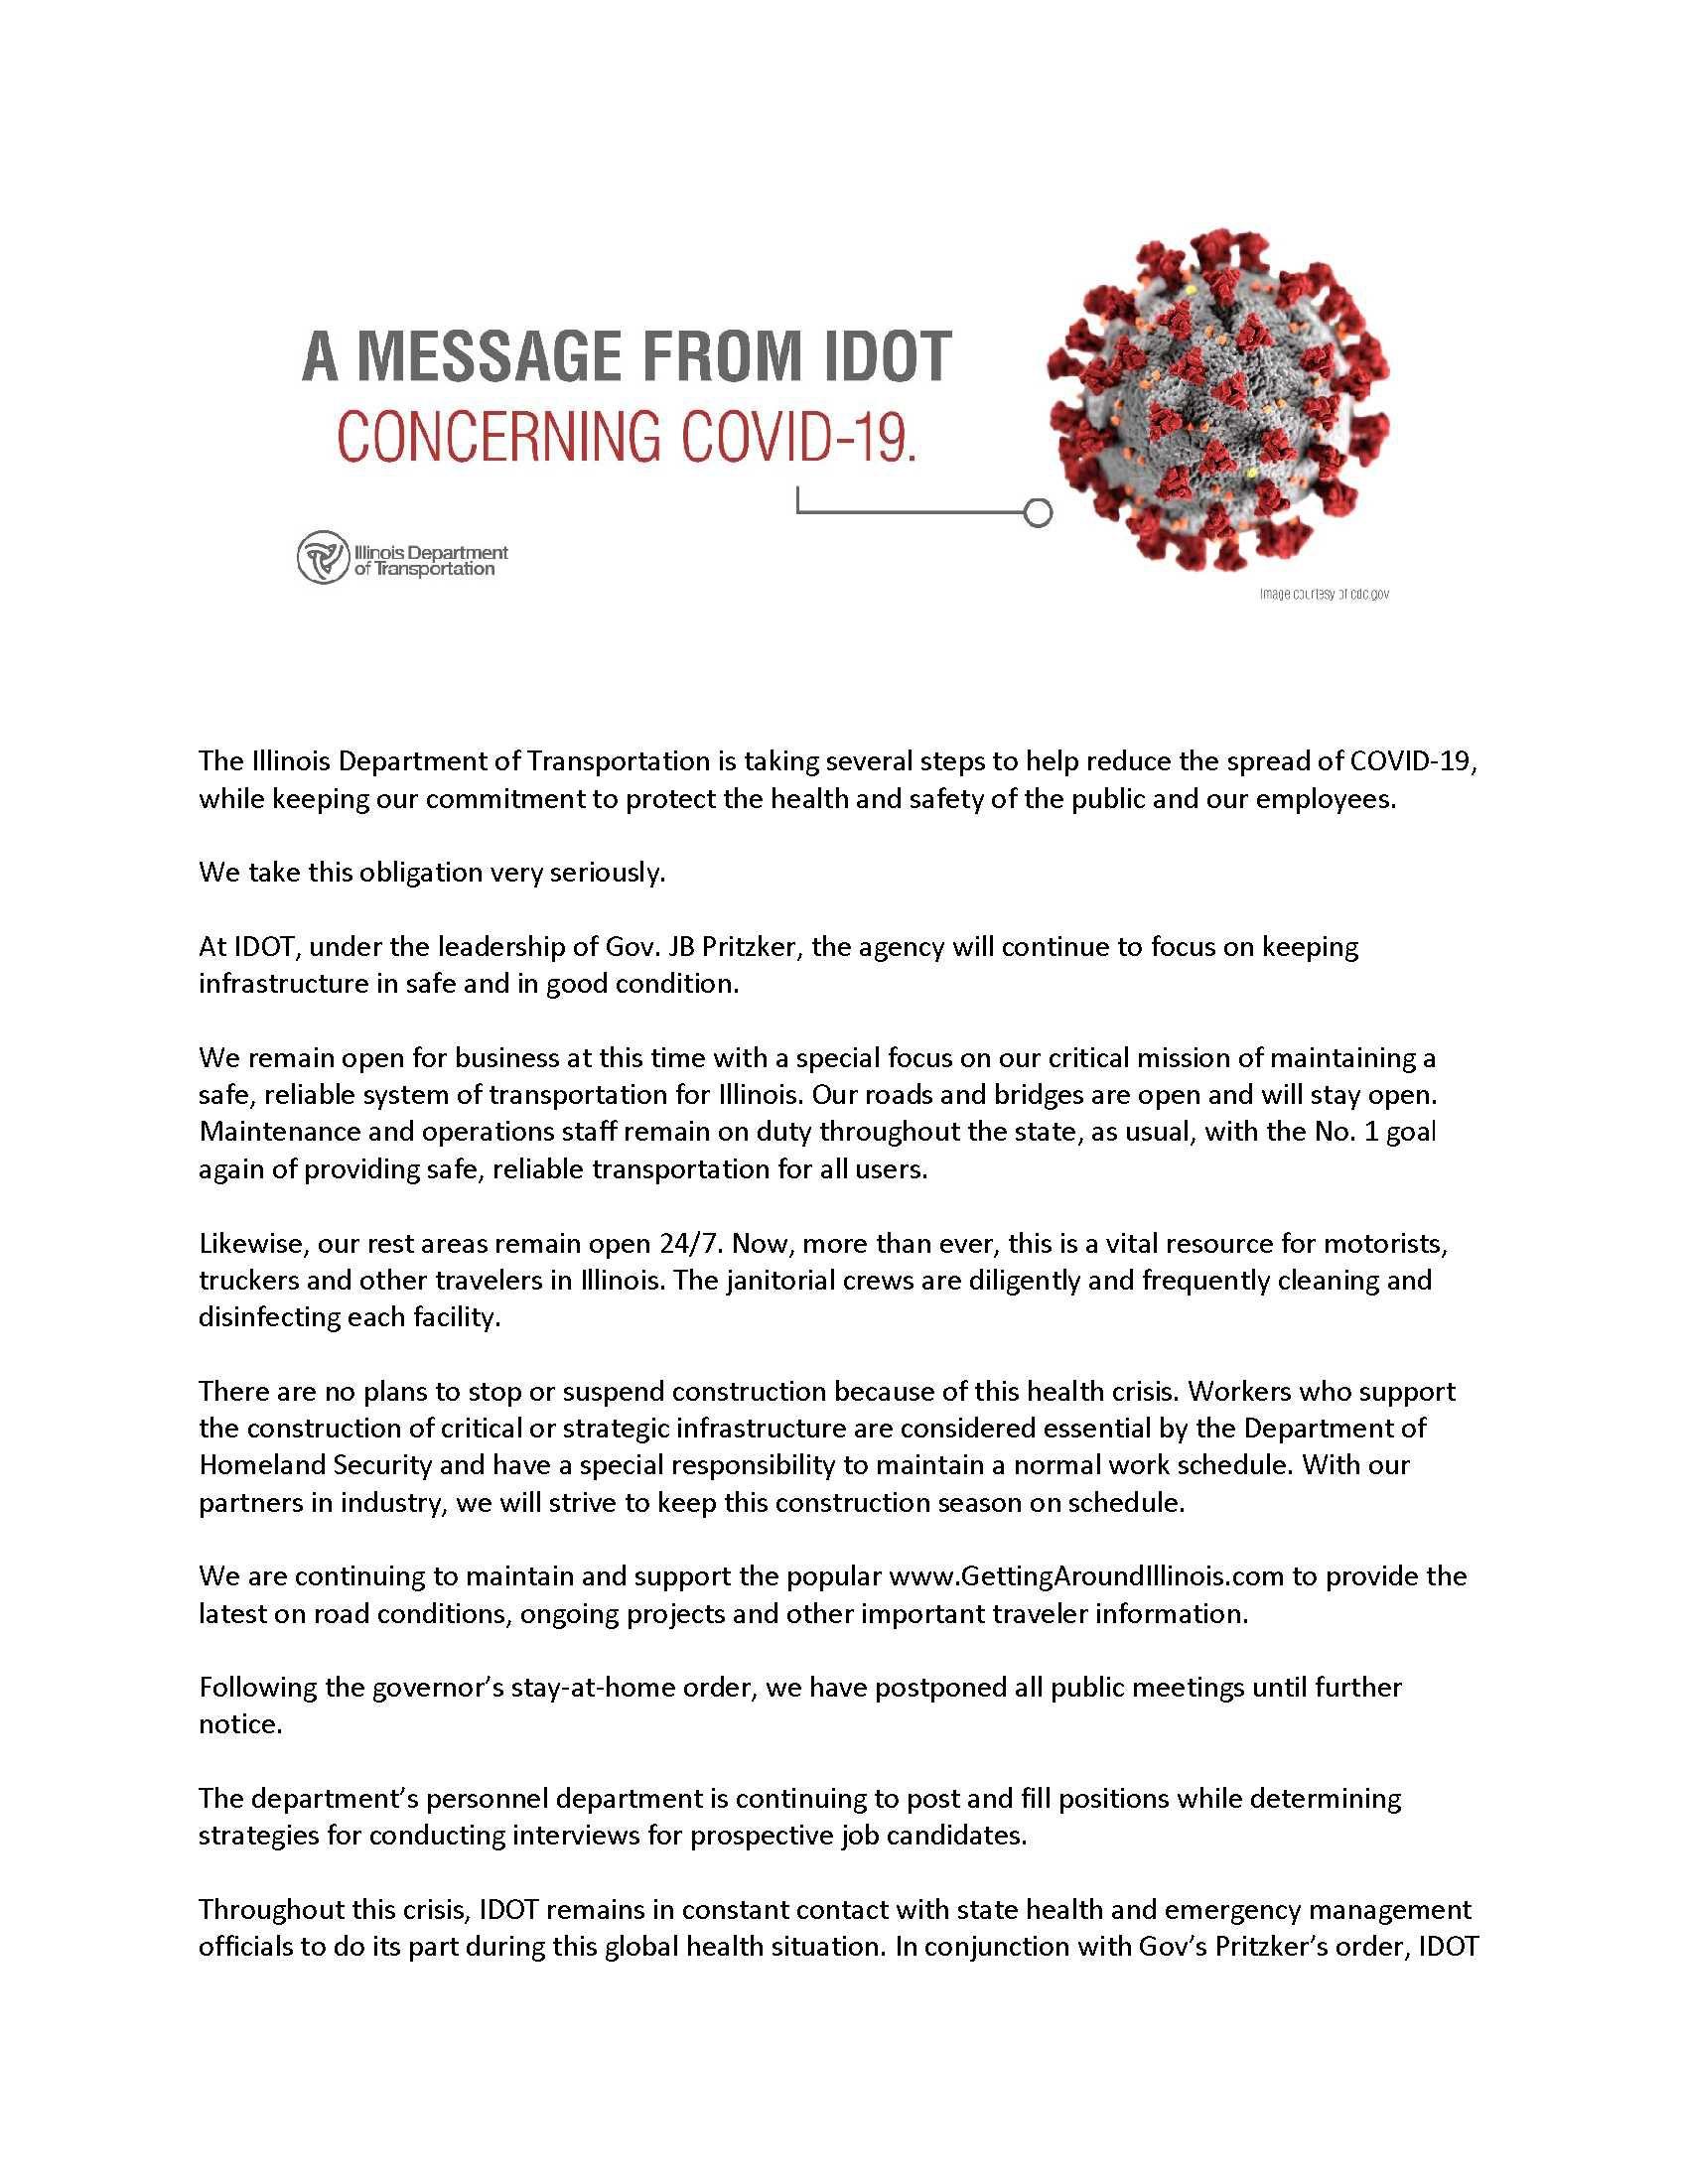 IDOT COVID-19 message_1.jpg